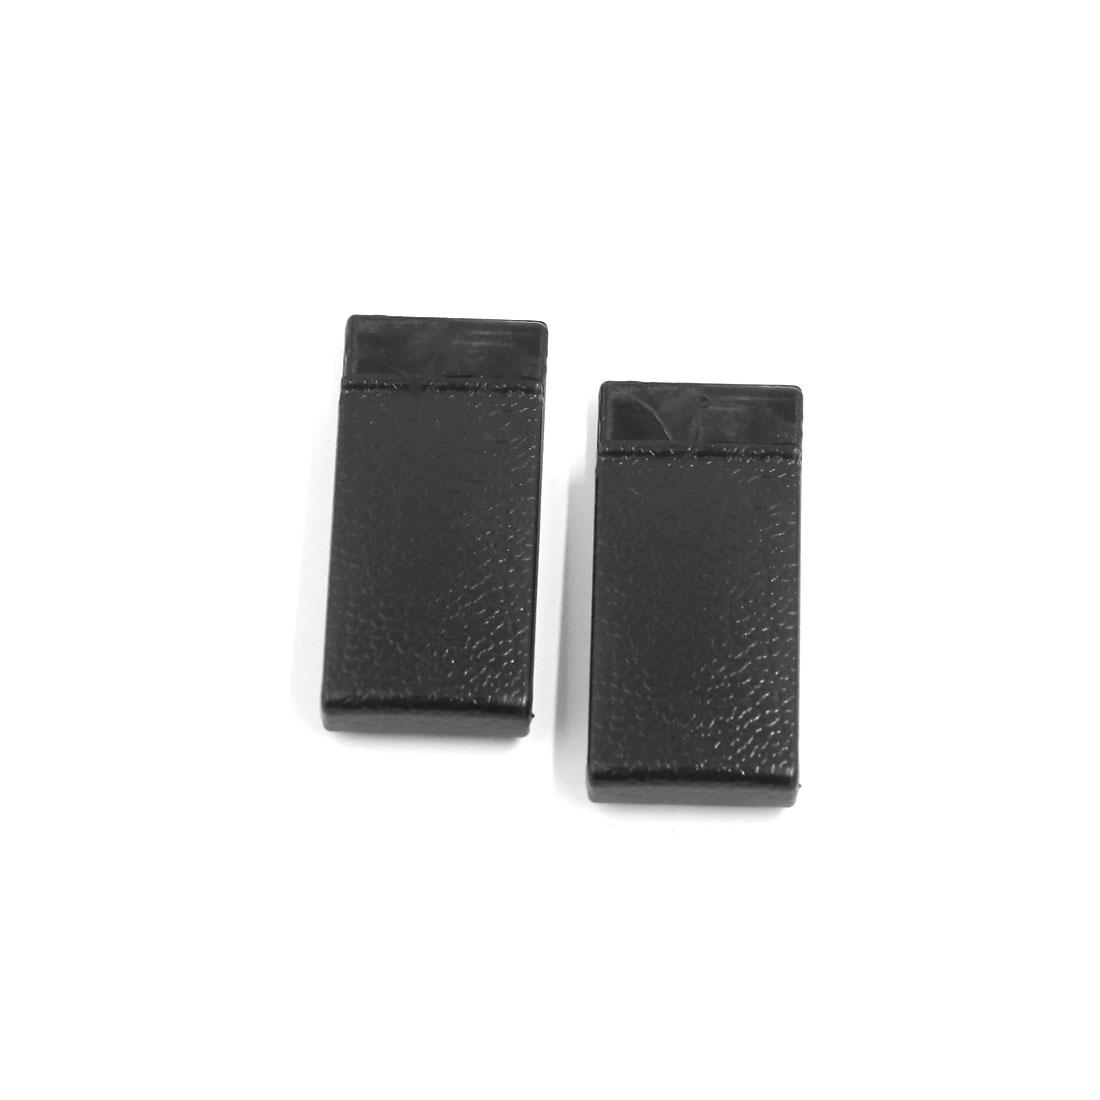 Black Plastic Sticky Car Card Bill Paper Glasses Storage Holder Clip 2pcs